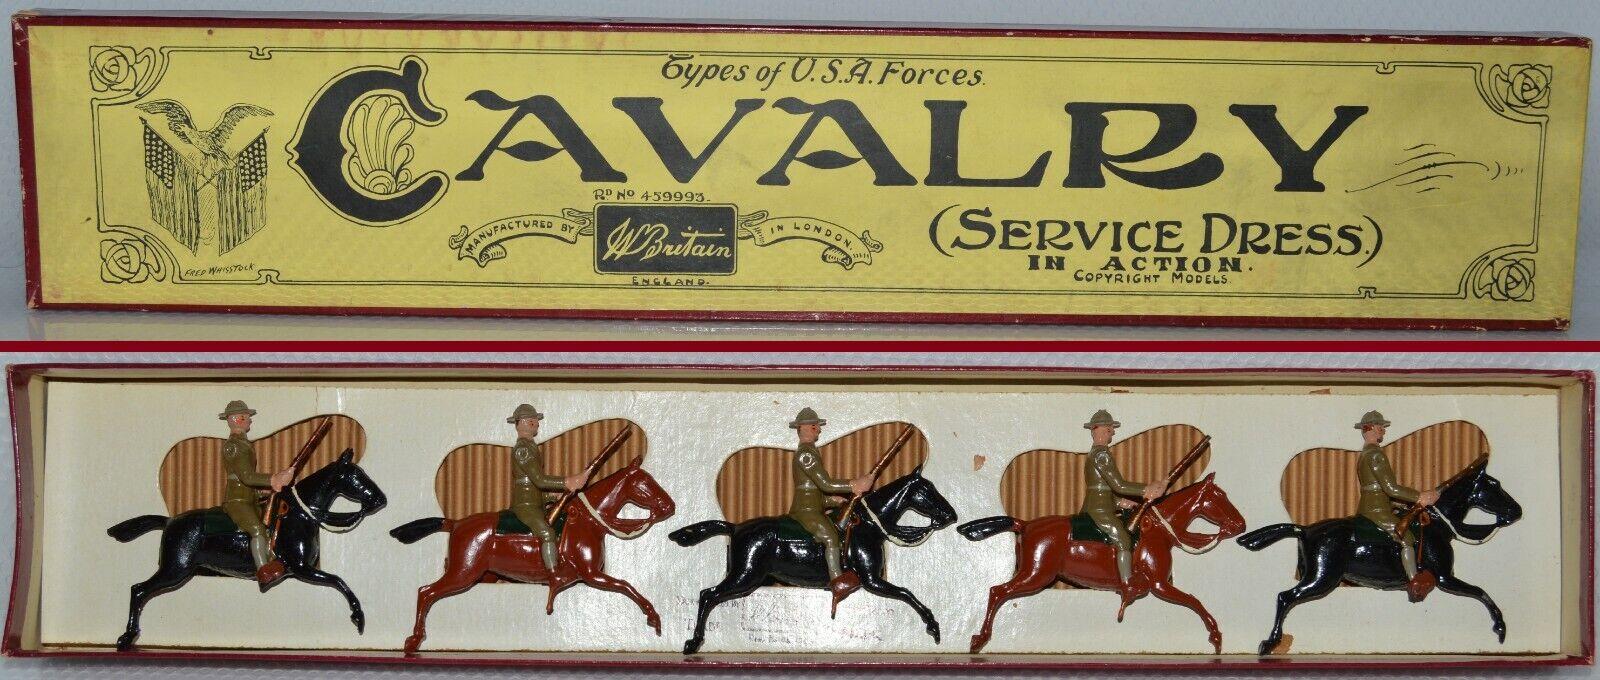 Britter före kriget, U S A s kavalleri (ca. 1928) EXCELLENT AA-10676